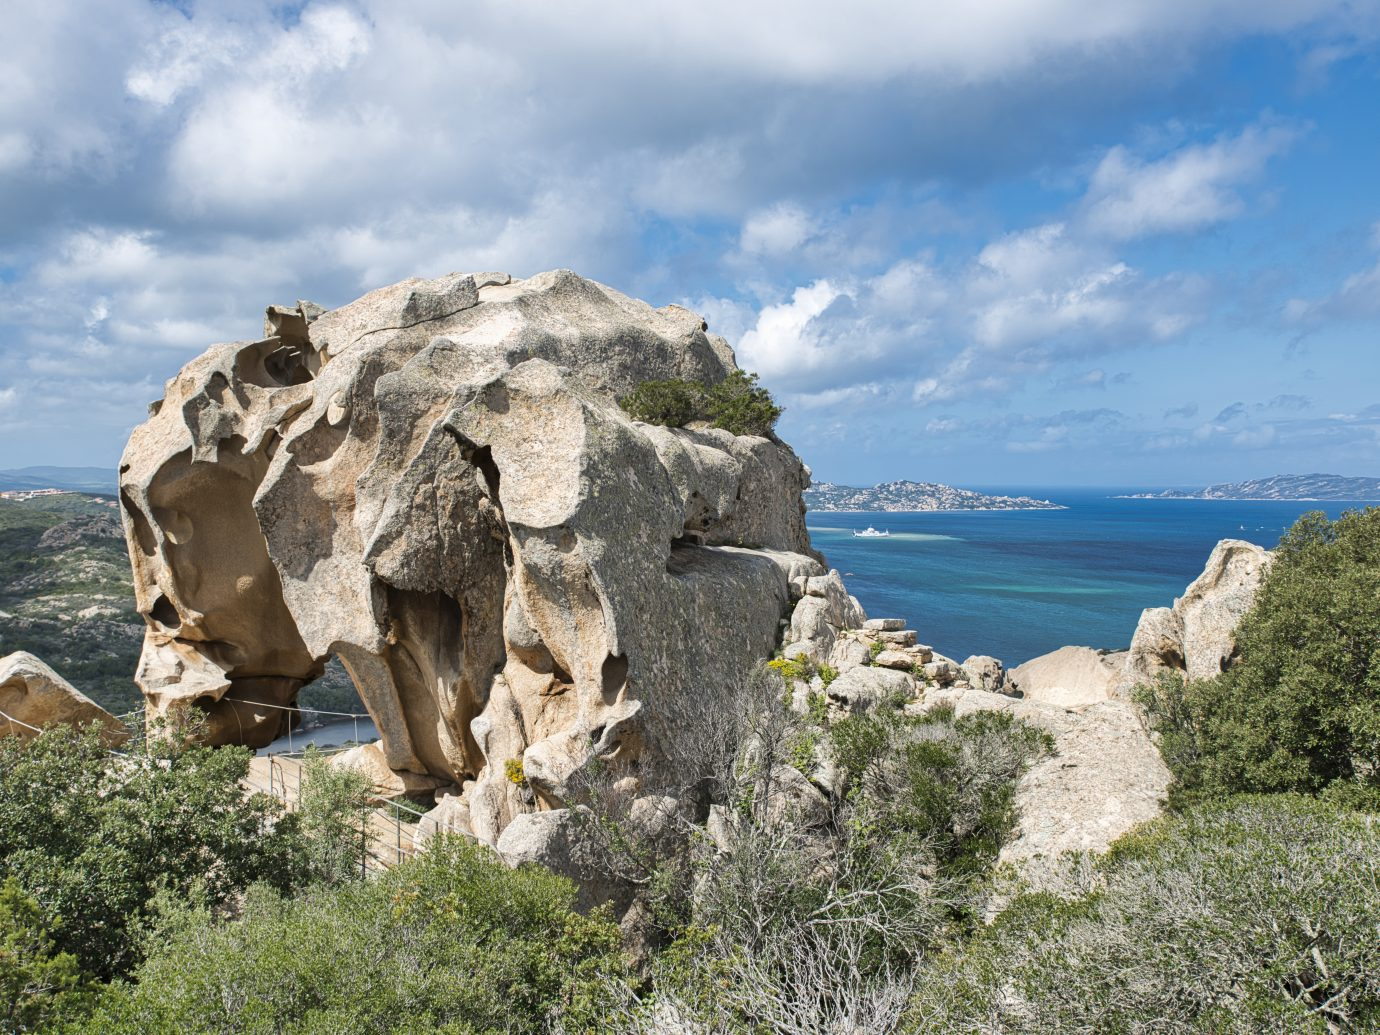 Capo d'Orso in Sardinia, Italy